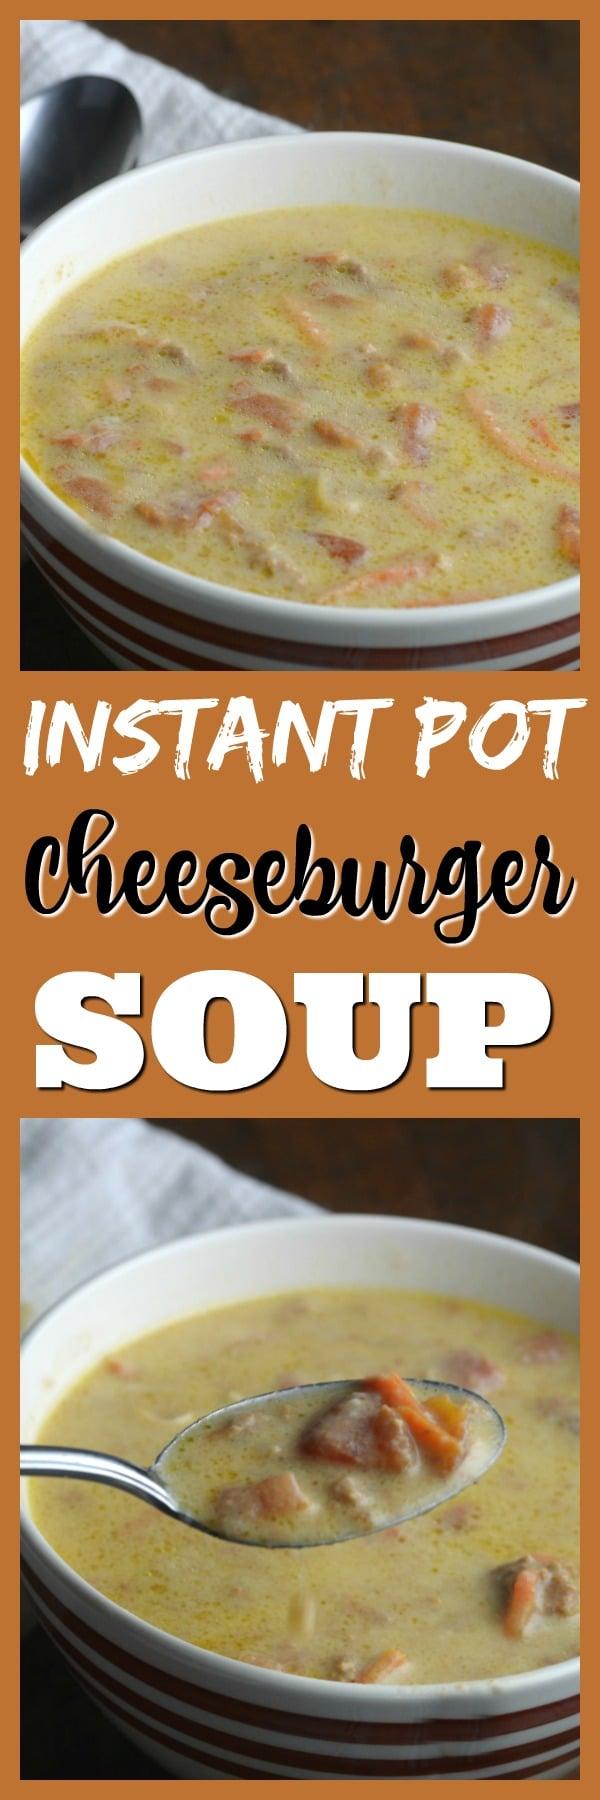 instant-pot-cheeseburger-soup